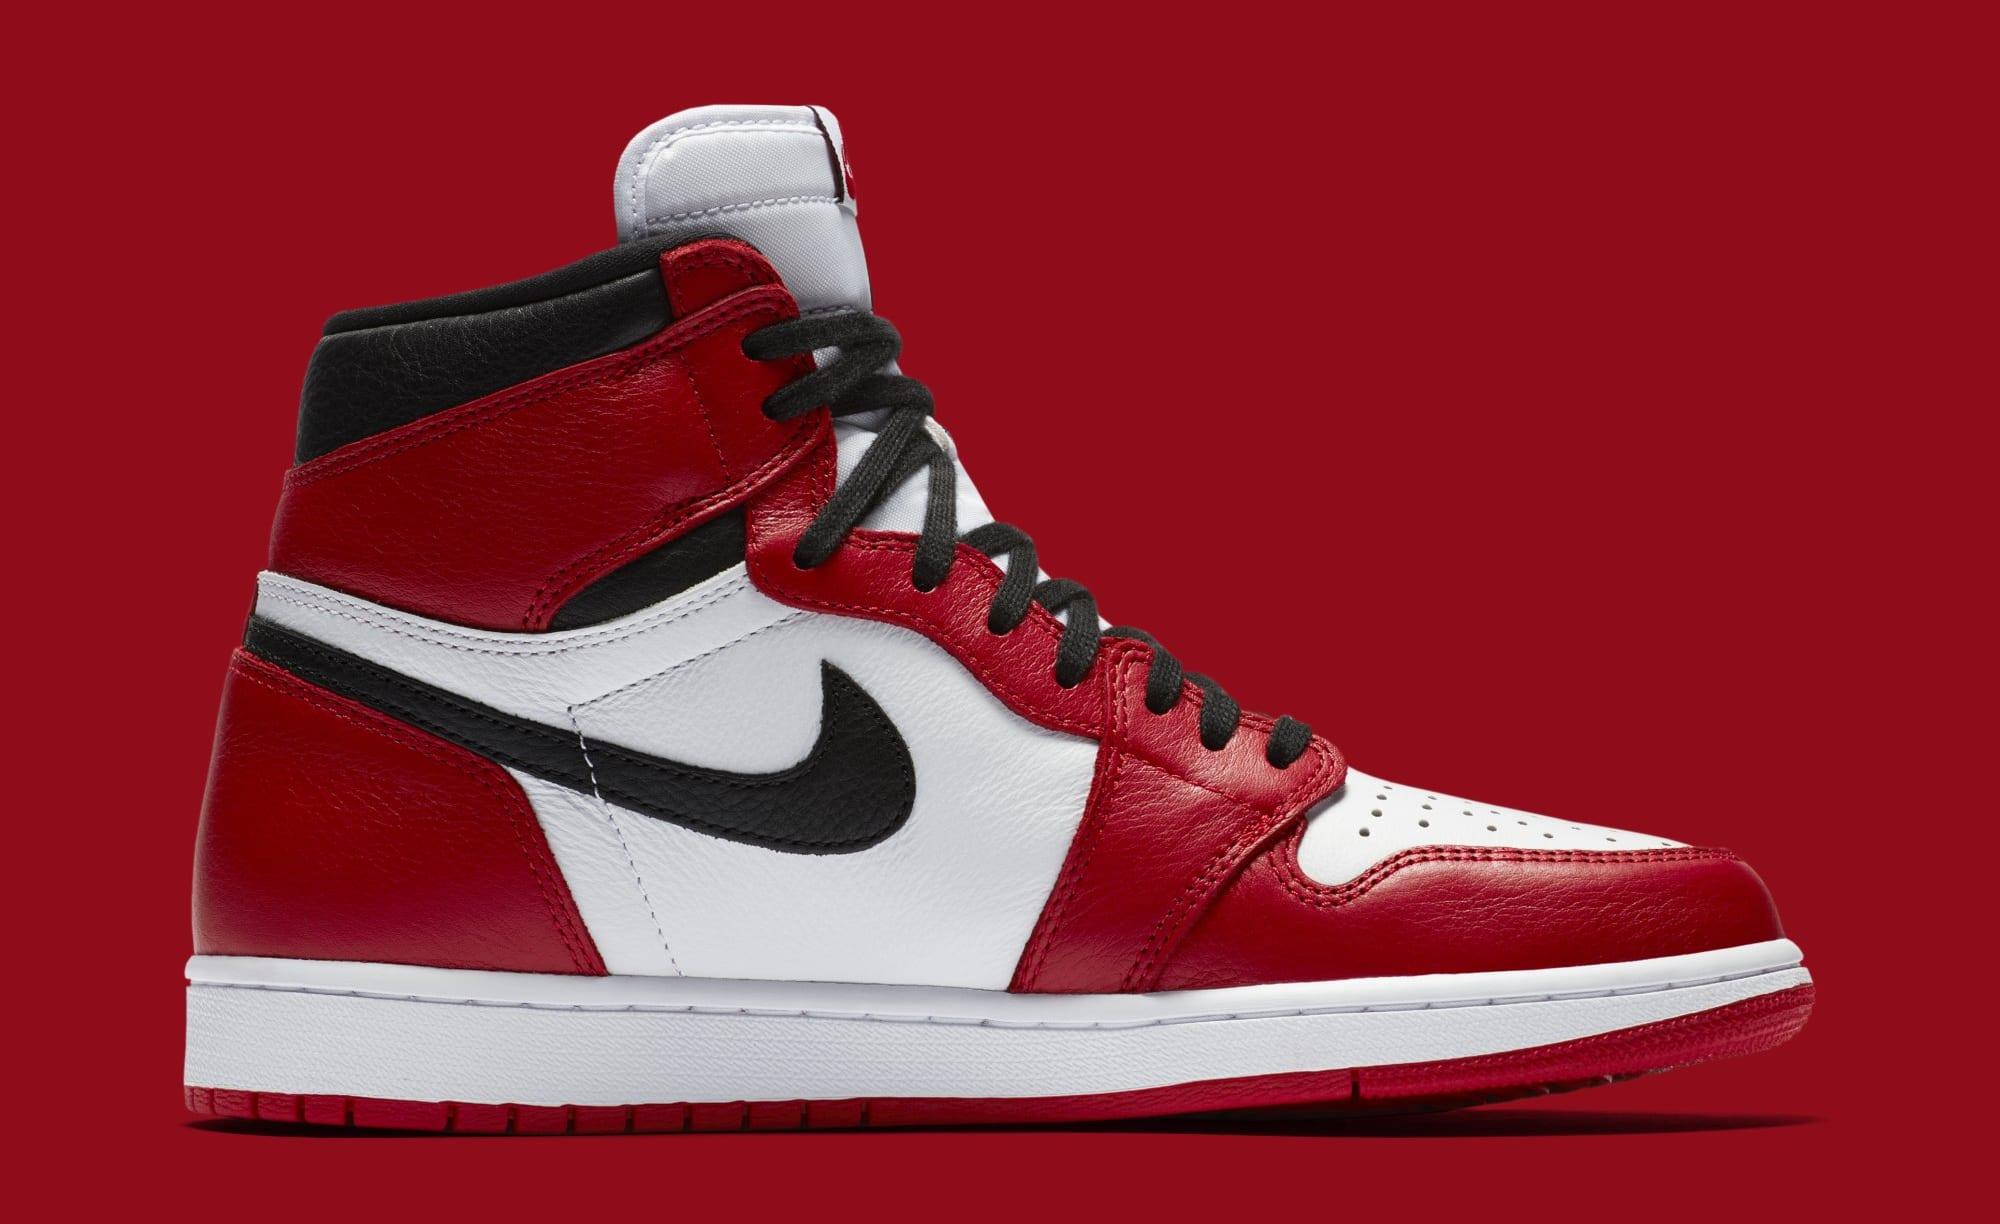 Air Jordan 1 Retro 'Homage TO Home' - 861428-061 - Size 7 -